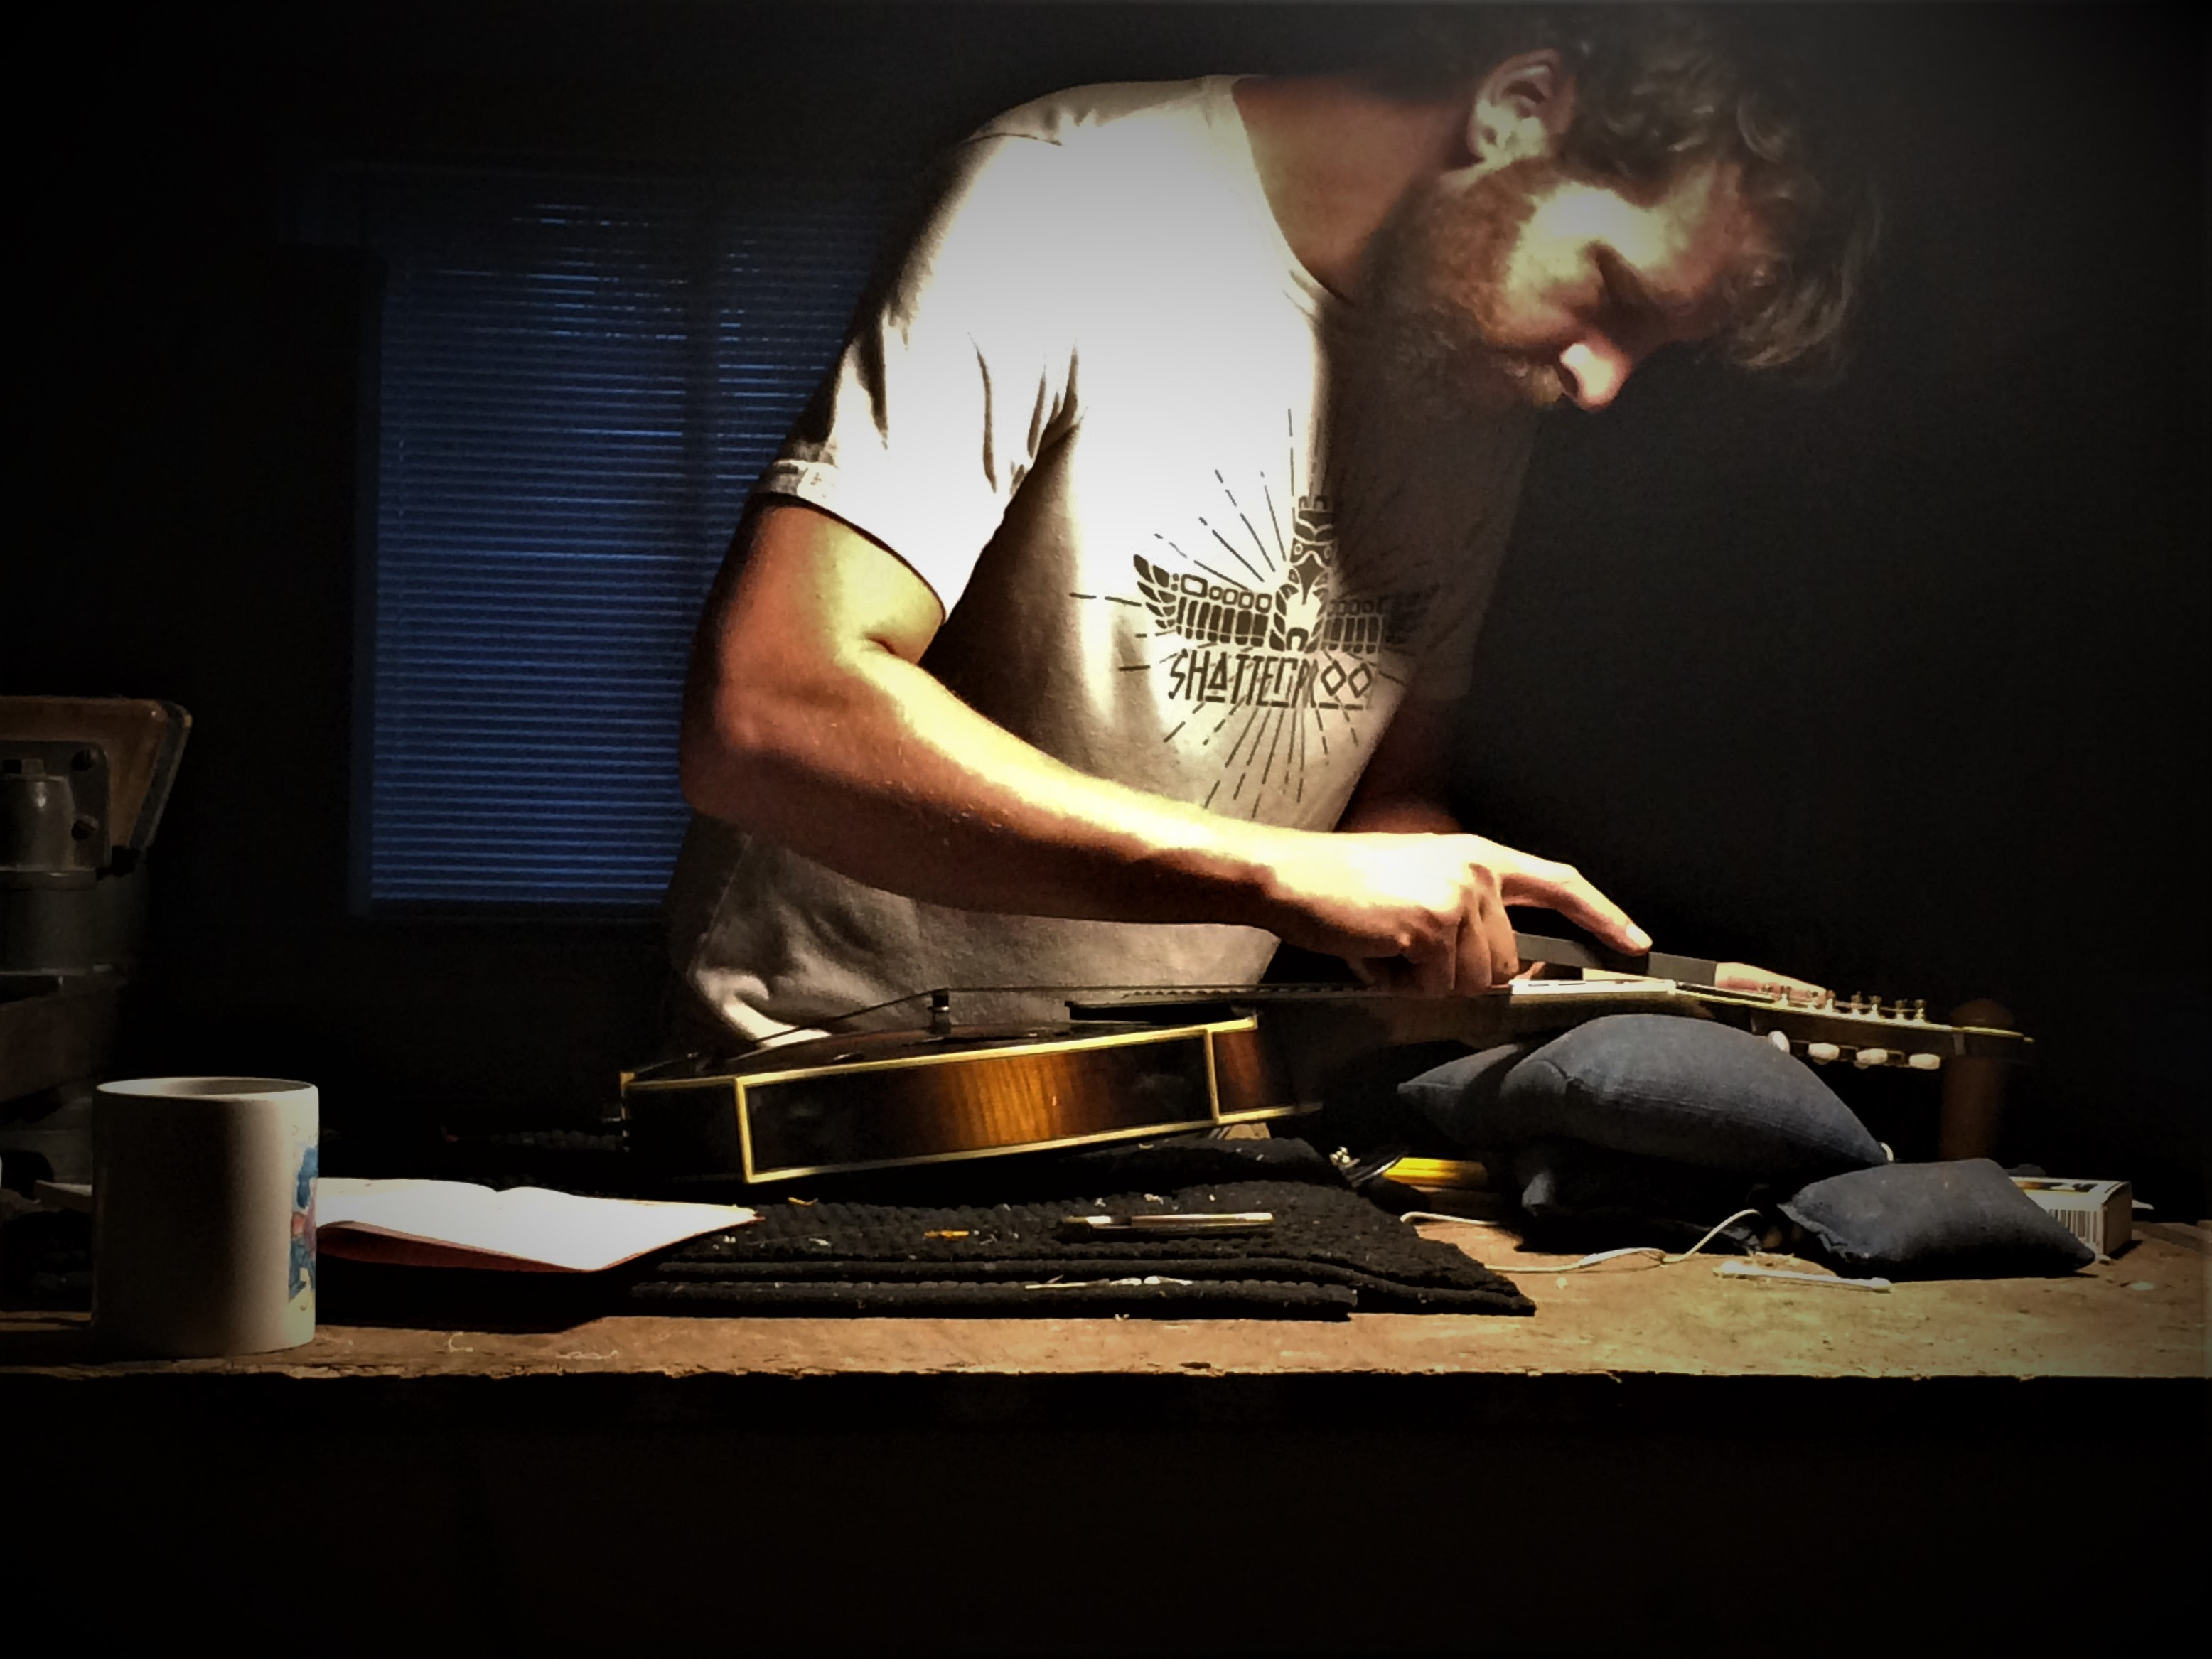 Setting up a Mandolin